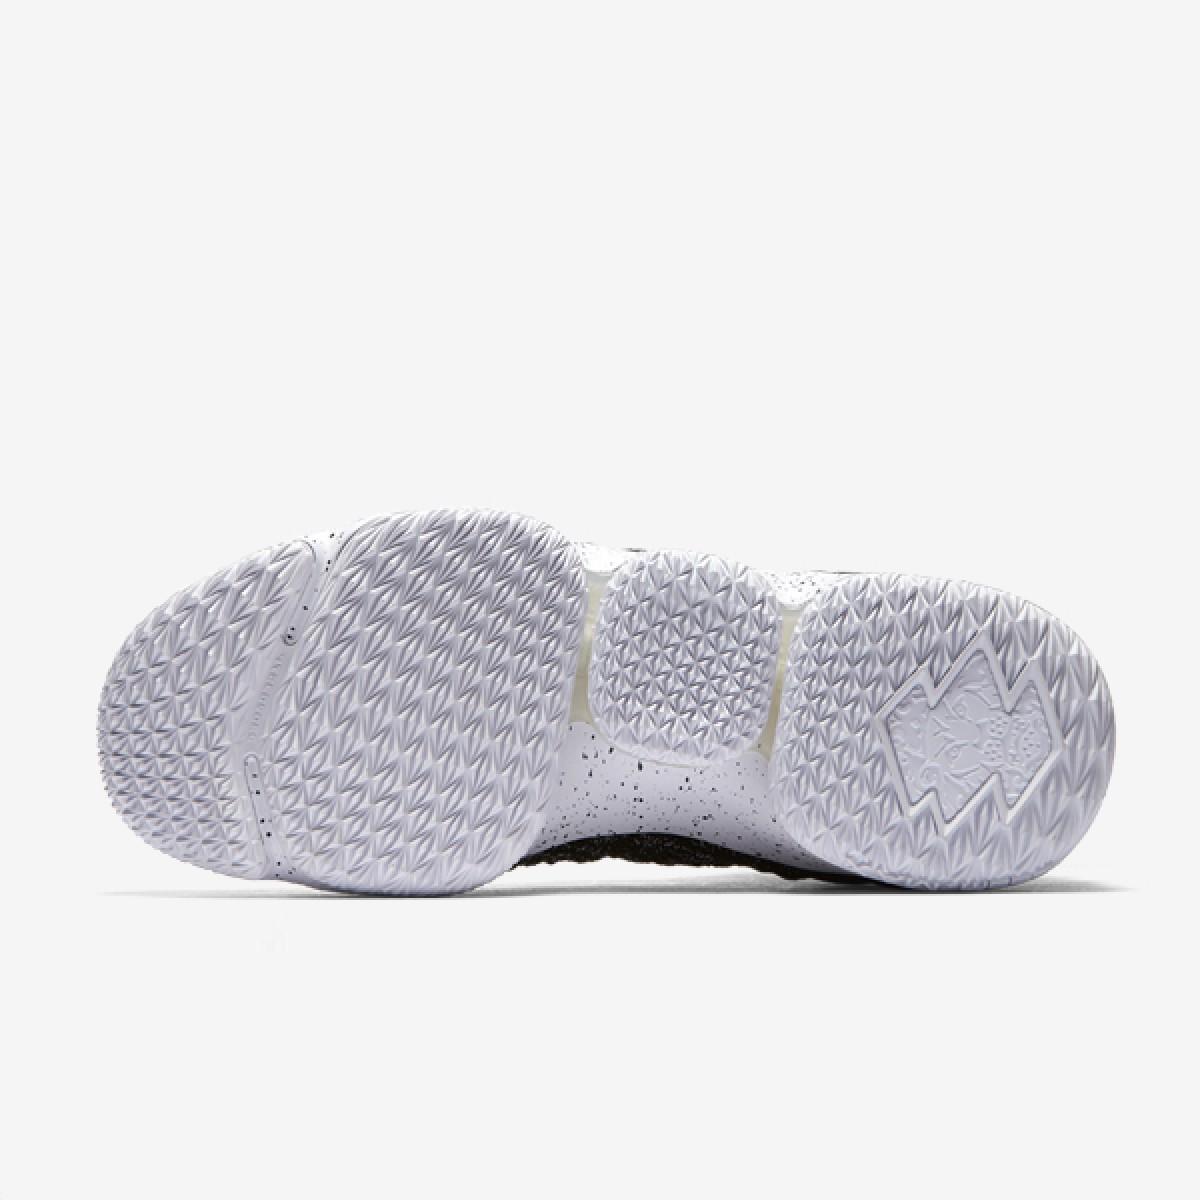 Nike Lebron XV 'Ashes' 897648-002